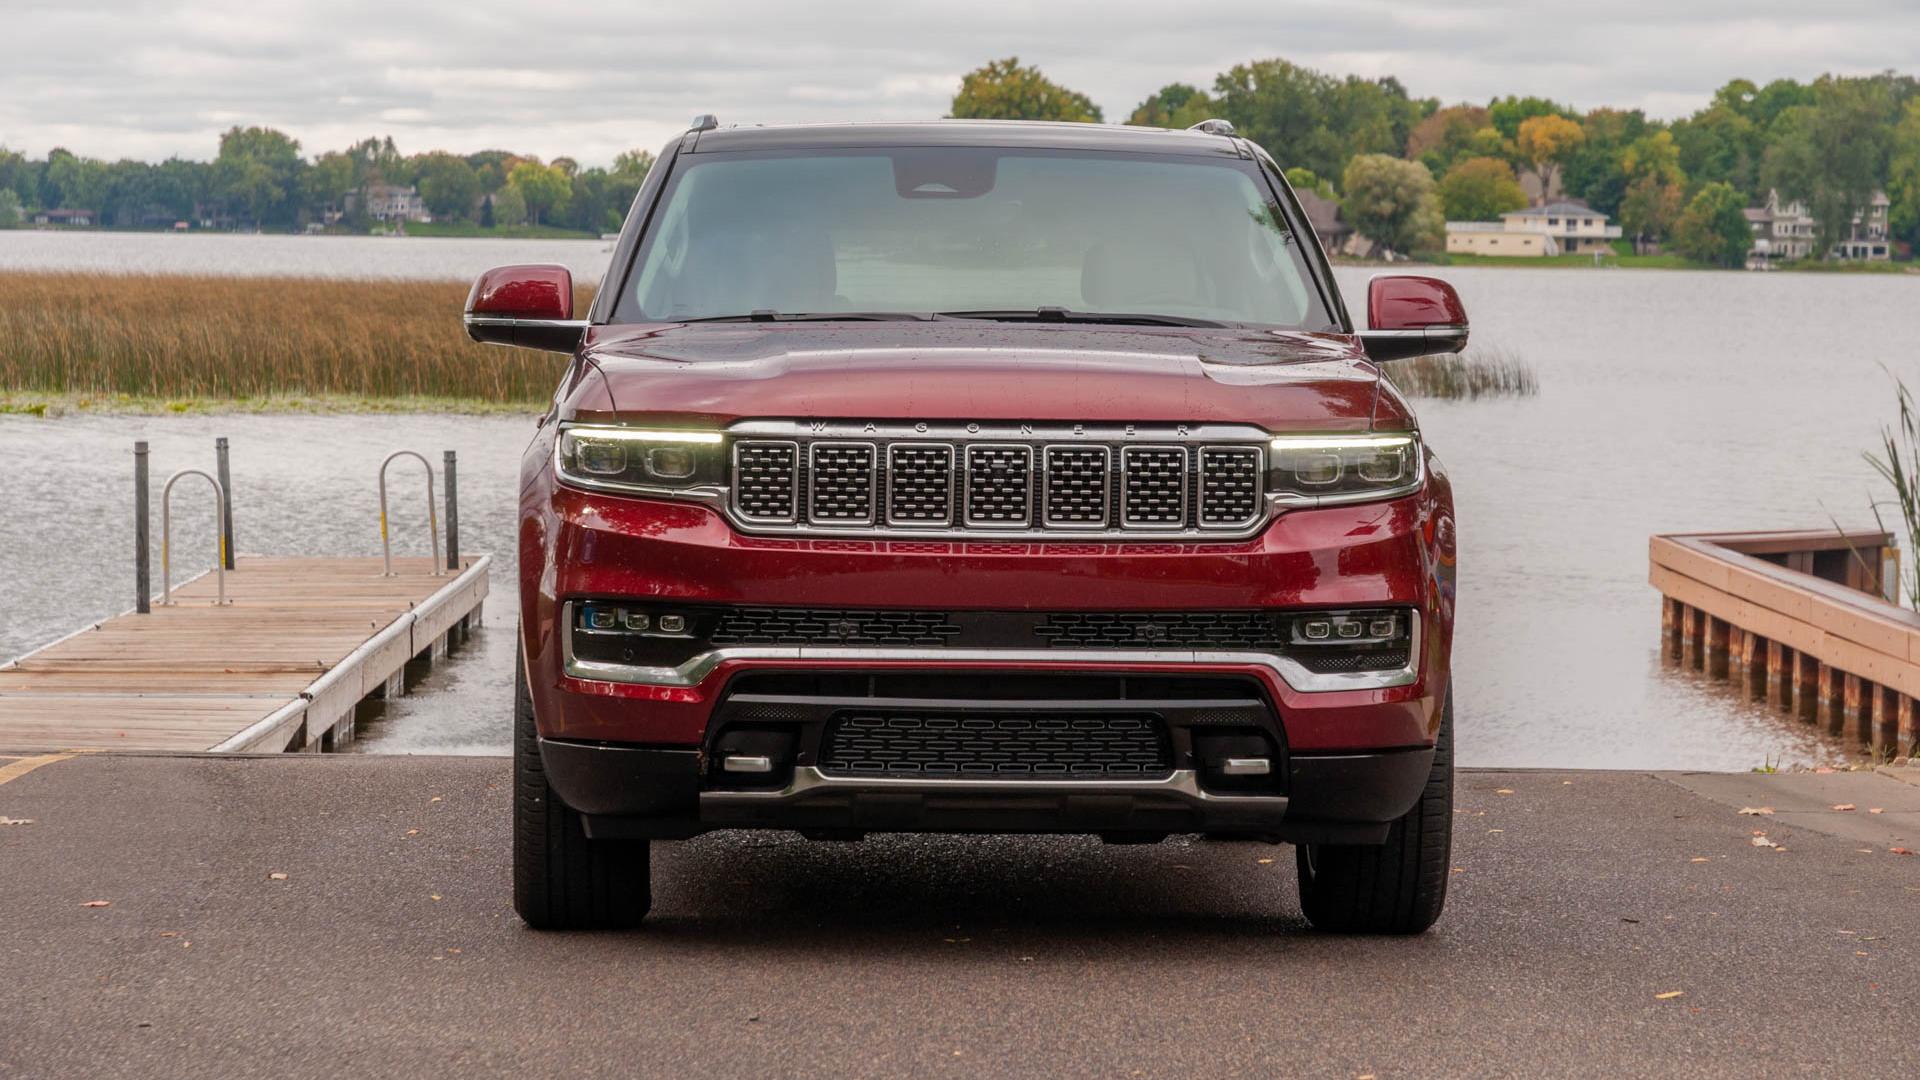 2022 Jeep Grand Wagoneer Series I 4x4